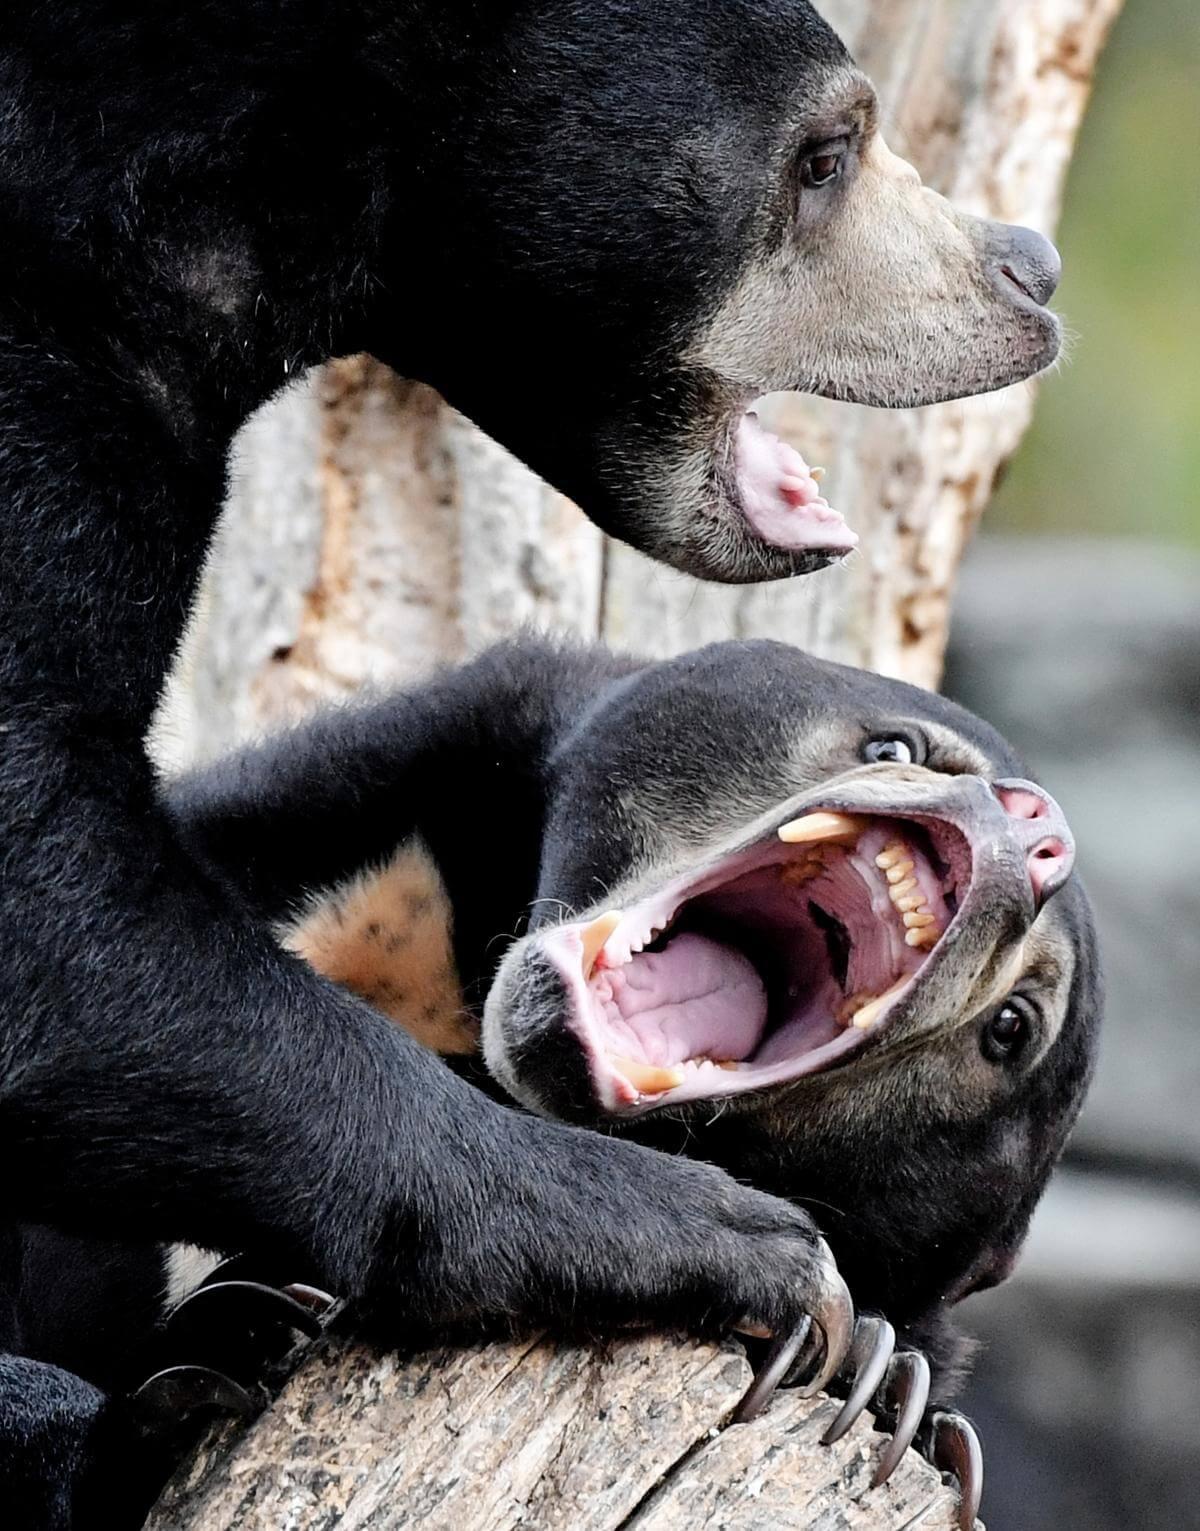 stunning animal images 5 (1)